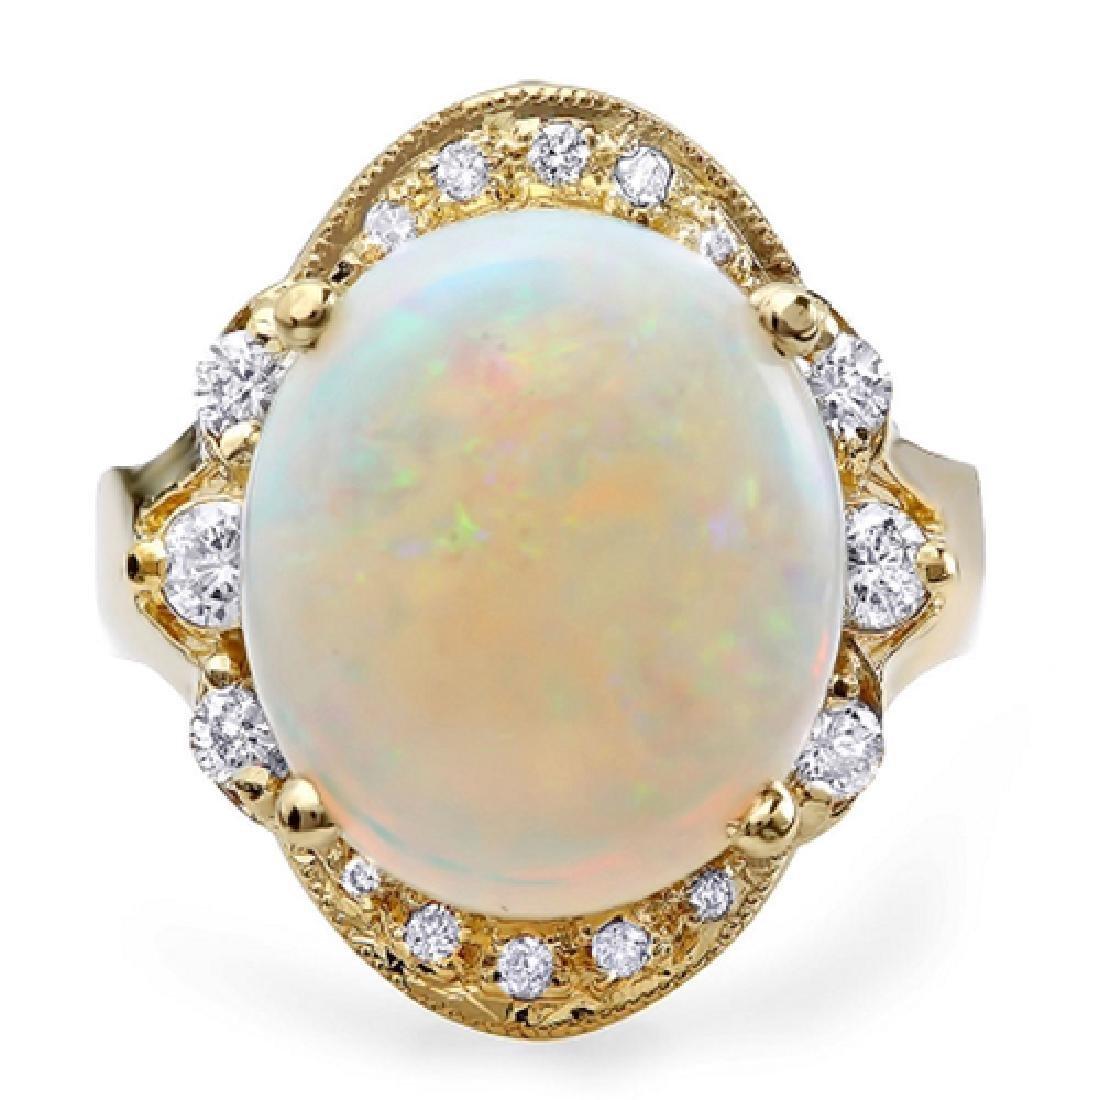 5.43 Carat Natural Opal 18K Solid Yellow Gold Diamond